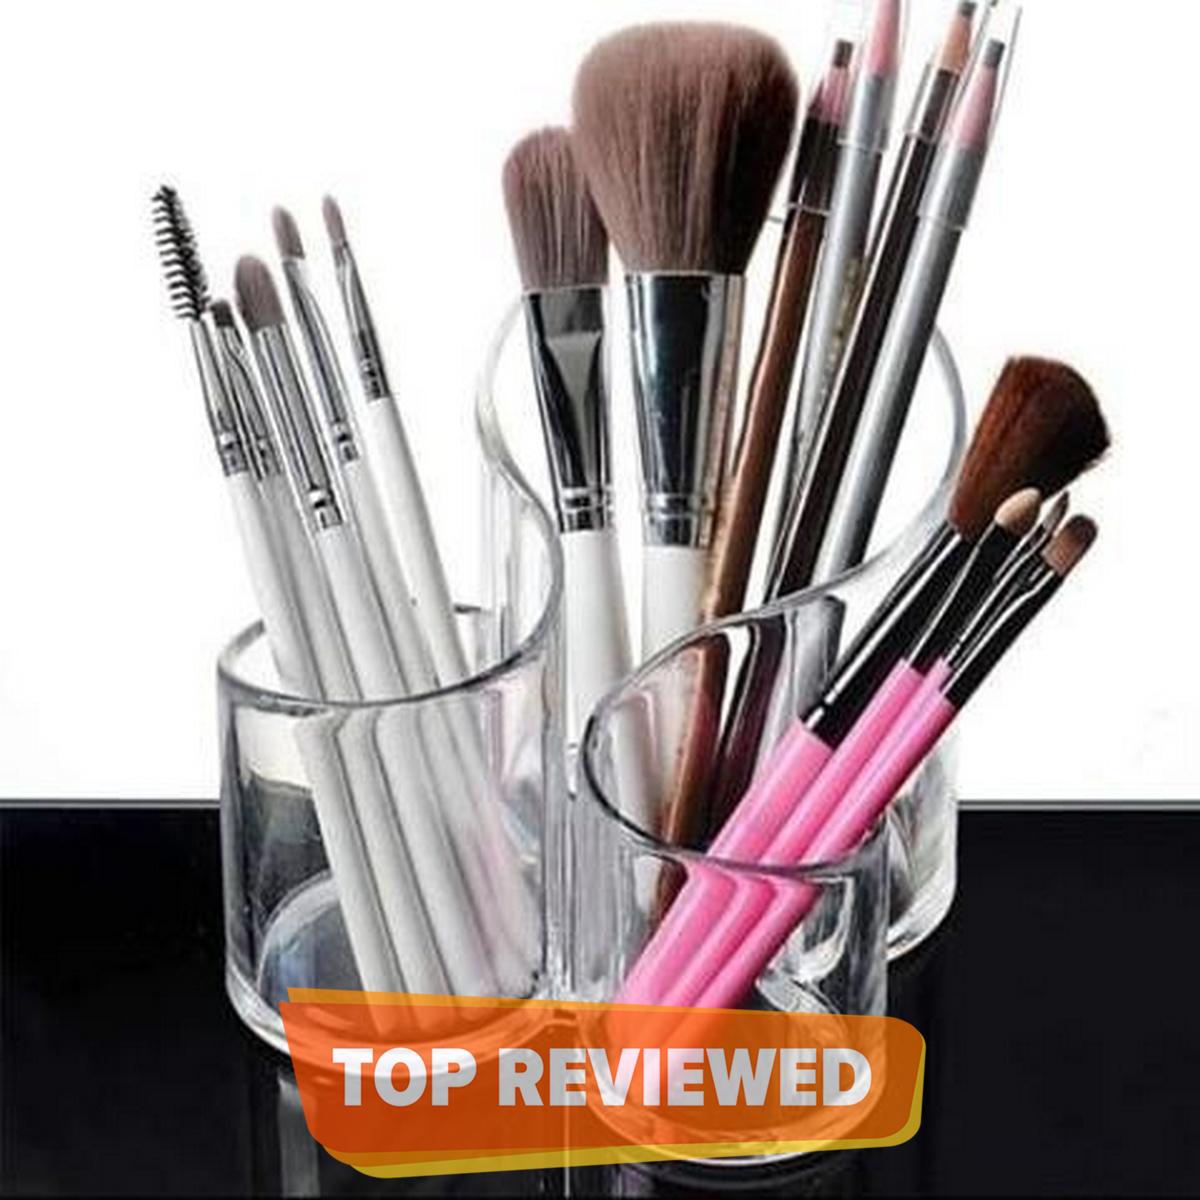 Cosmetic Makeup Organizer Transparent Acrylic Lipstick Holder Display Stand Nail Polish Eyebrow Pencil Storage Box Toothbrush Holder Stationary Holder